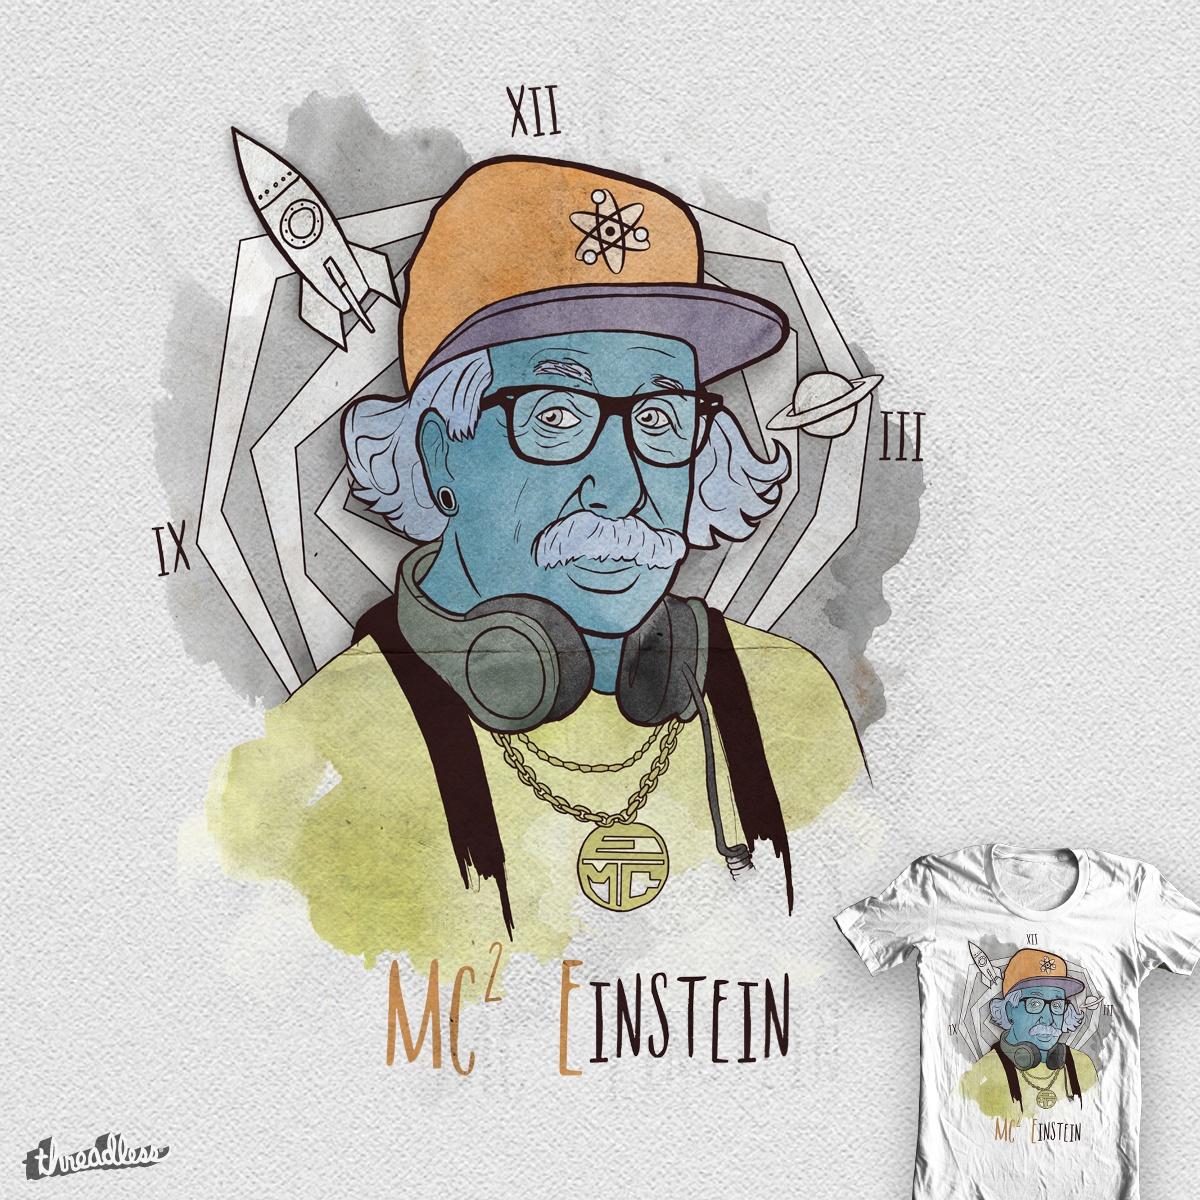 MC Einstein by GnomJordy on Threadless